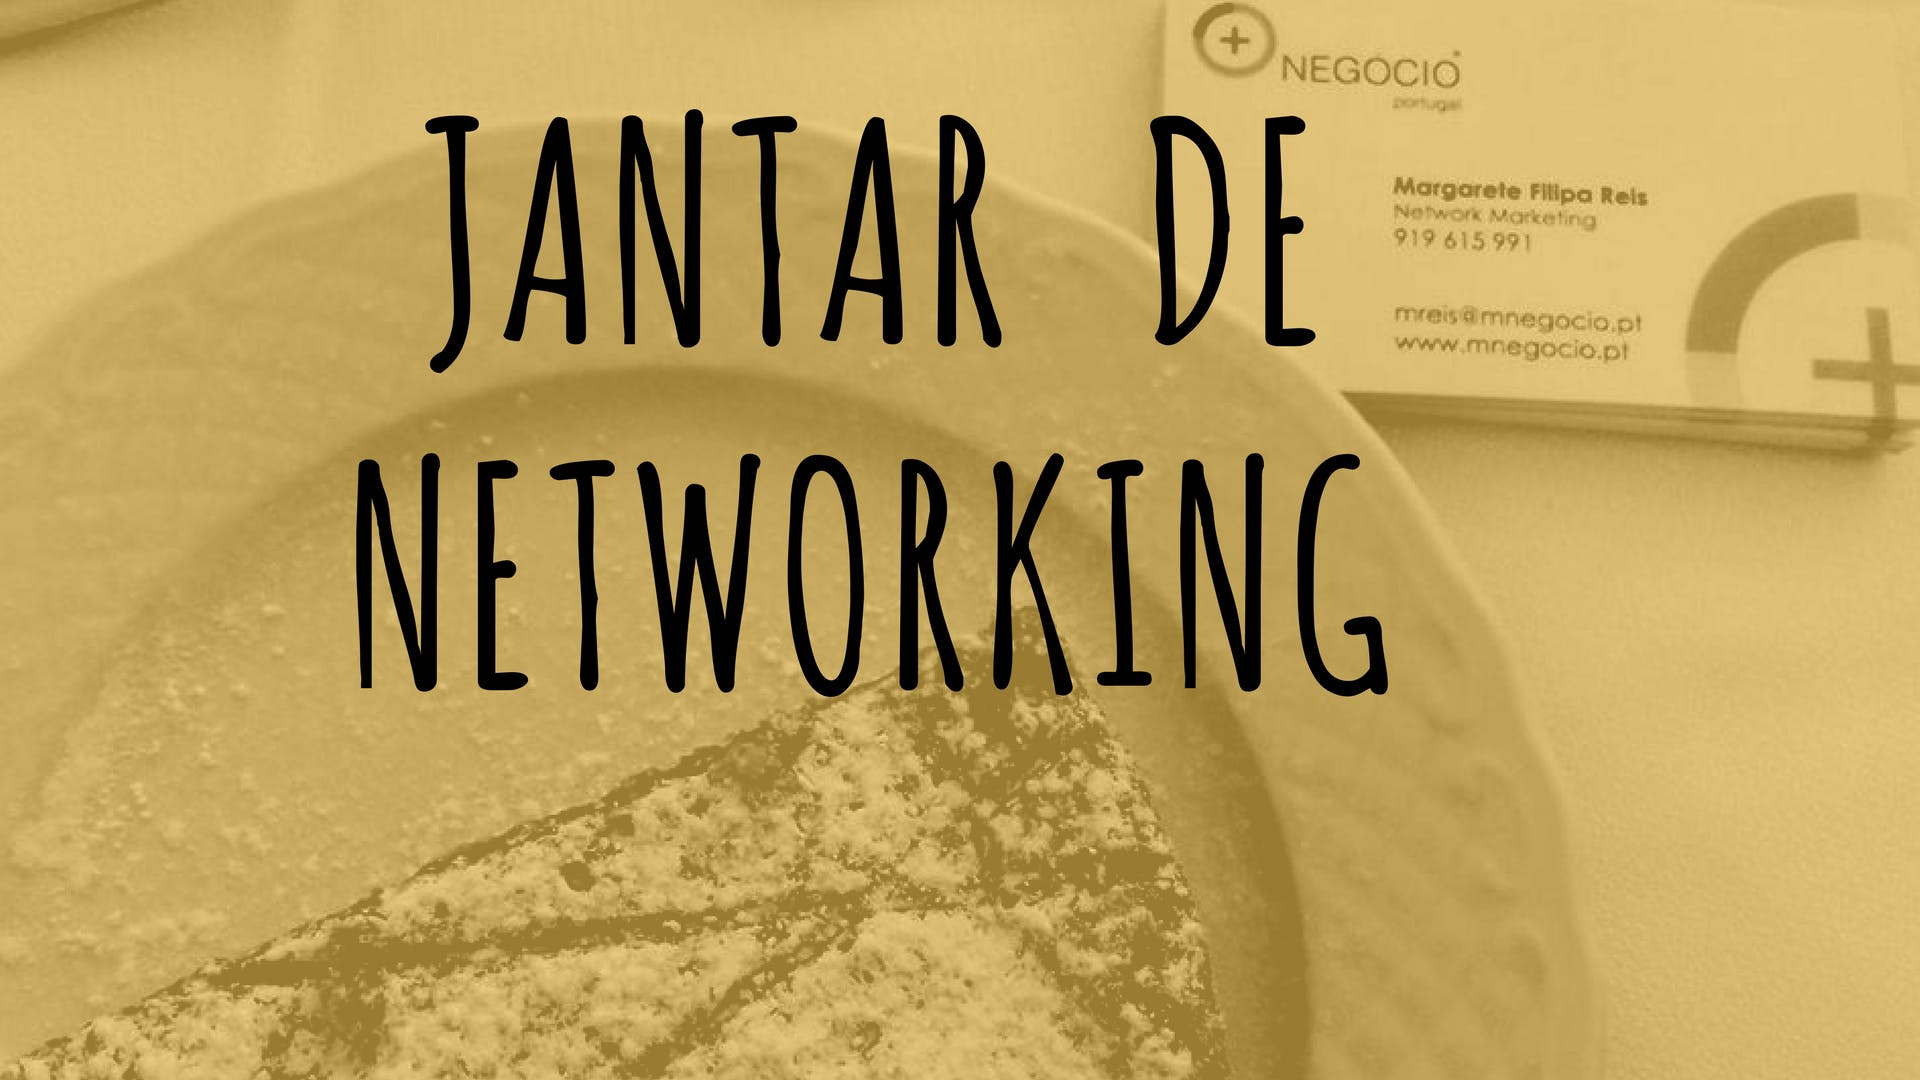 Jantar de networking no Porto: Contactos e op